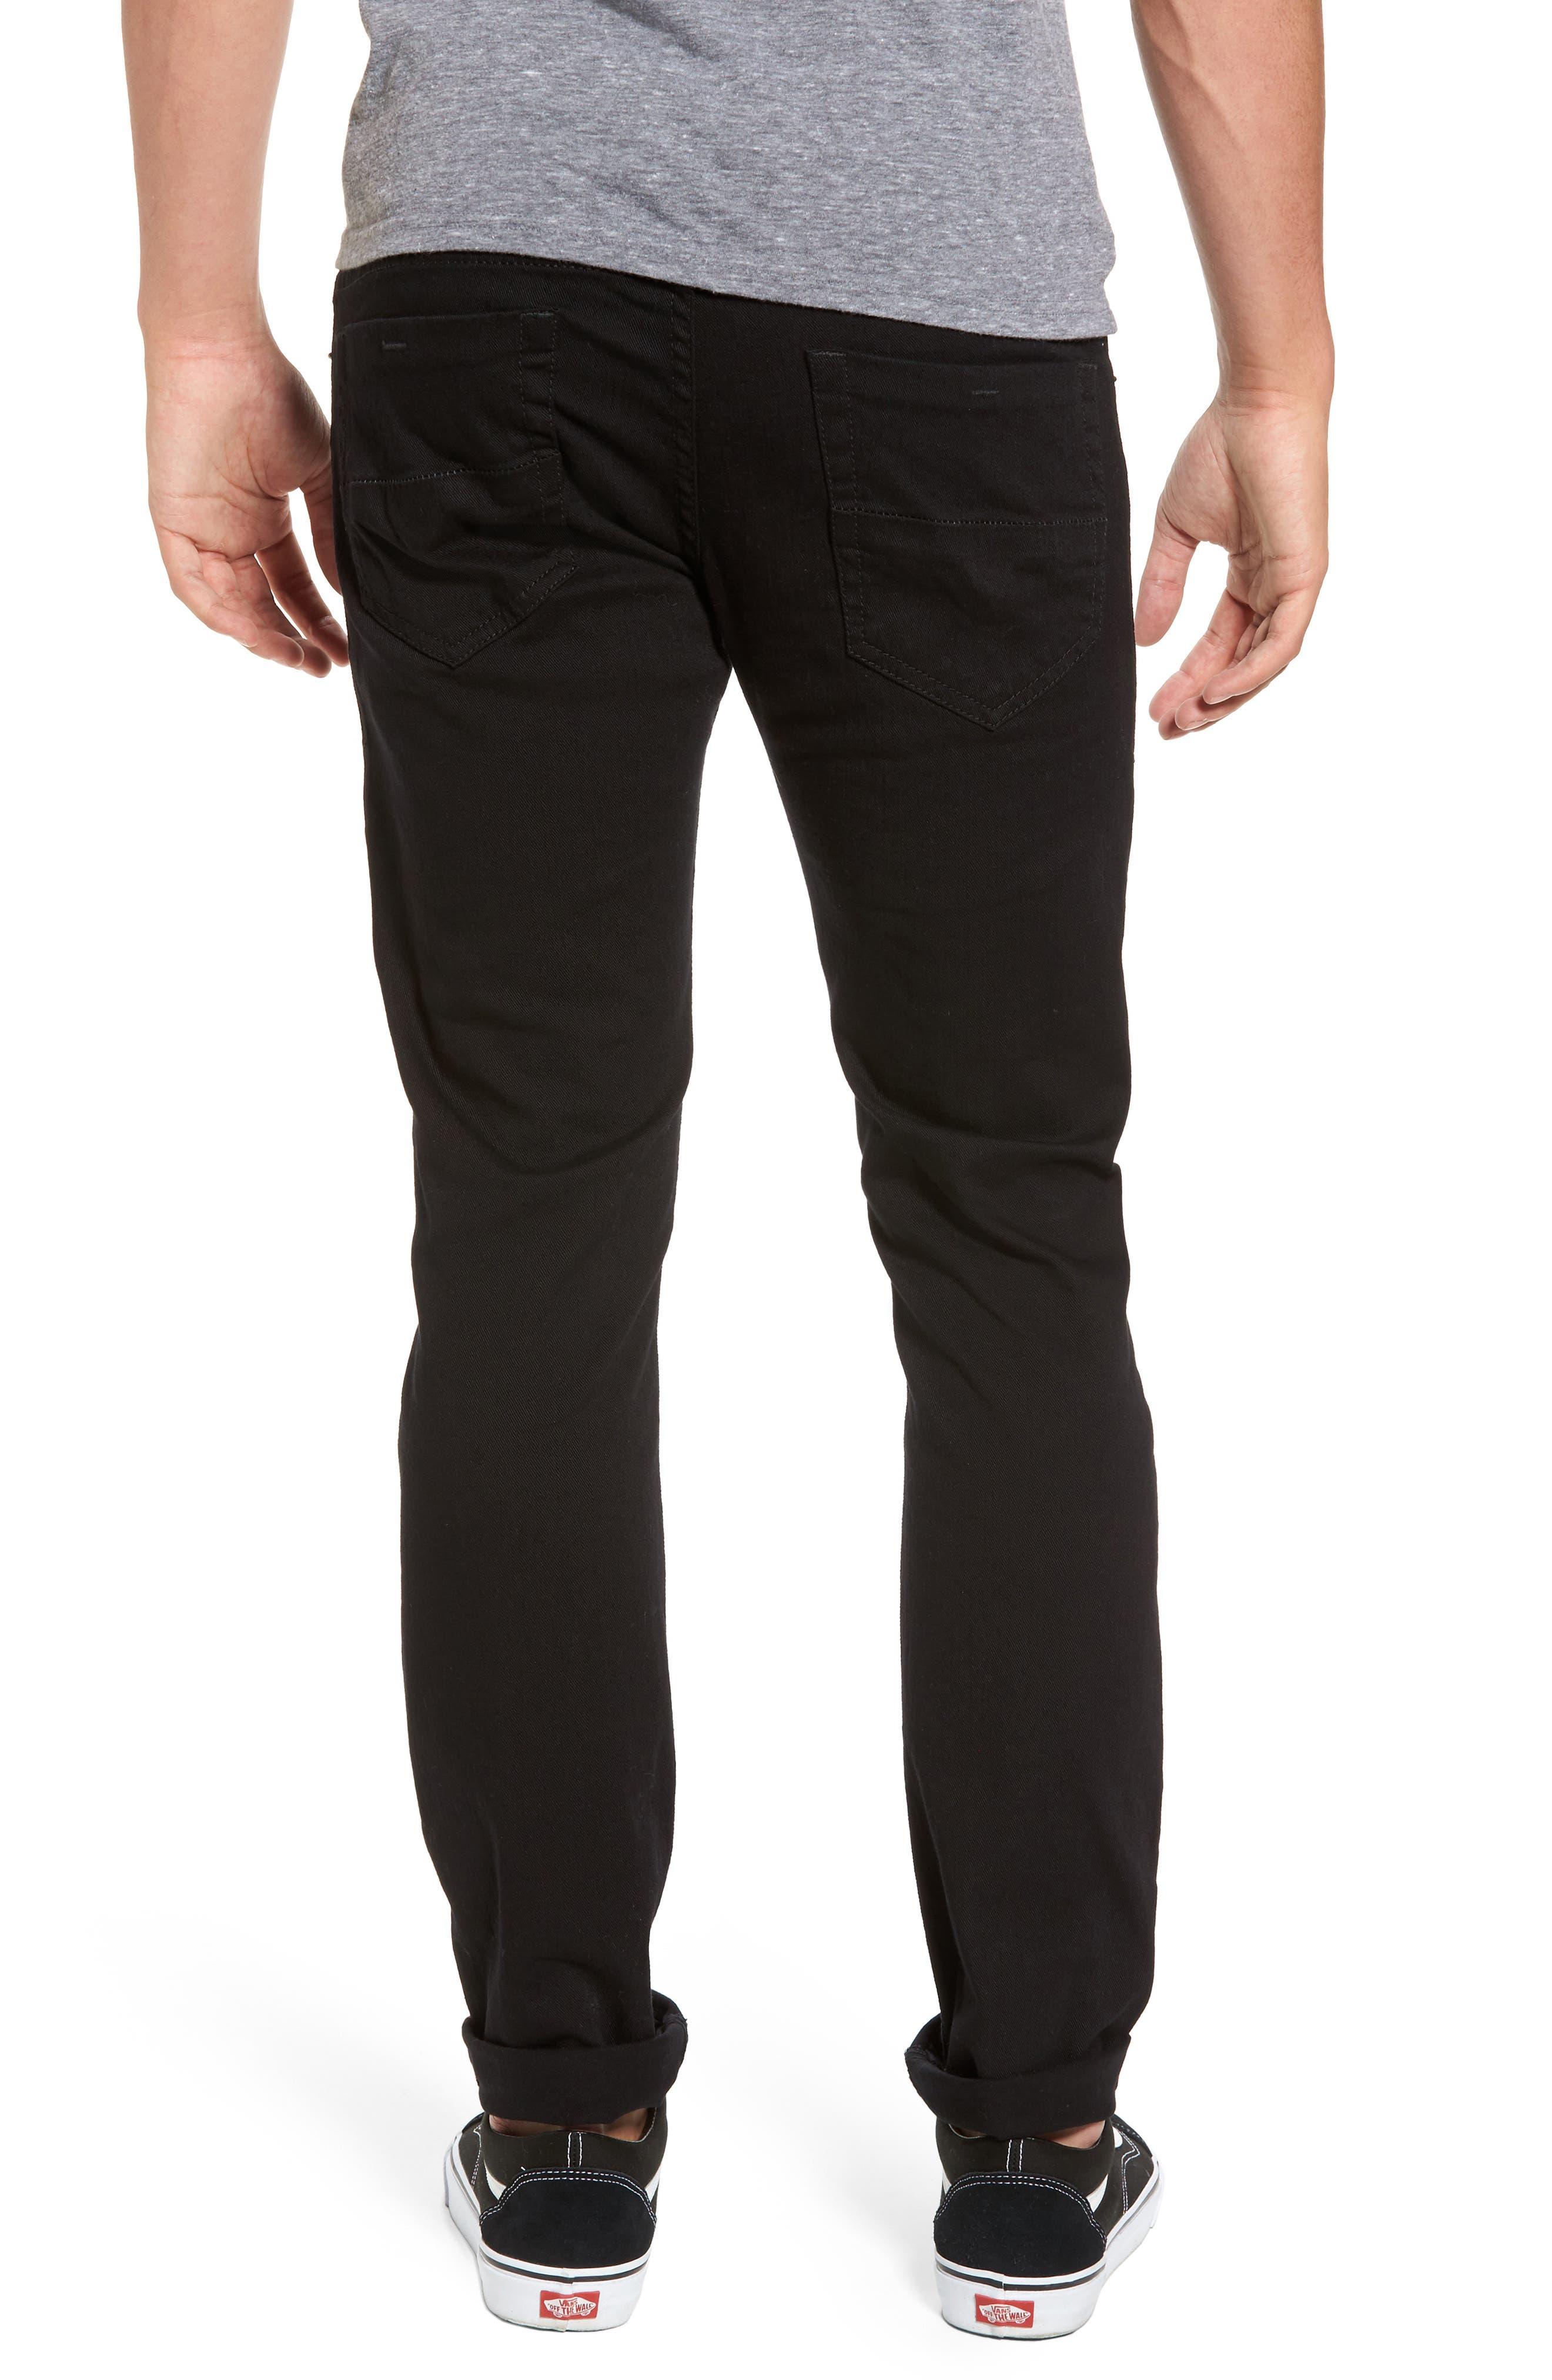 DIESEL<SUP>®</SUP>, Thommer Slim Fit Jeans, Alternate thumbnail 2, color, BLACK/ DENIM